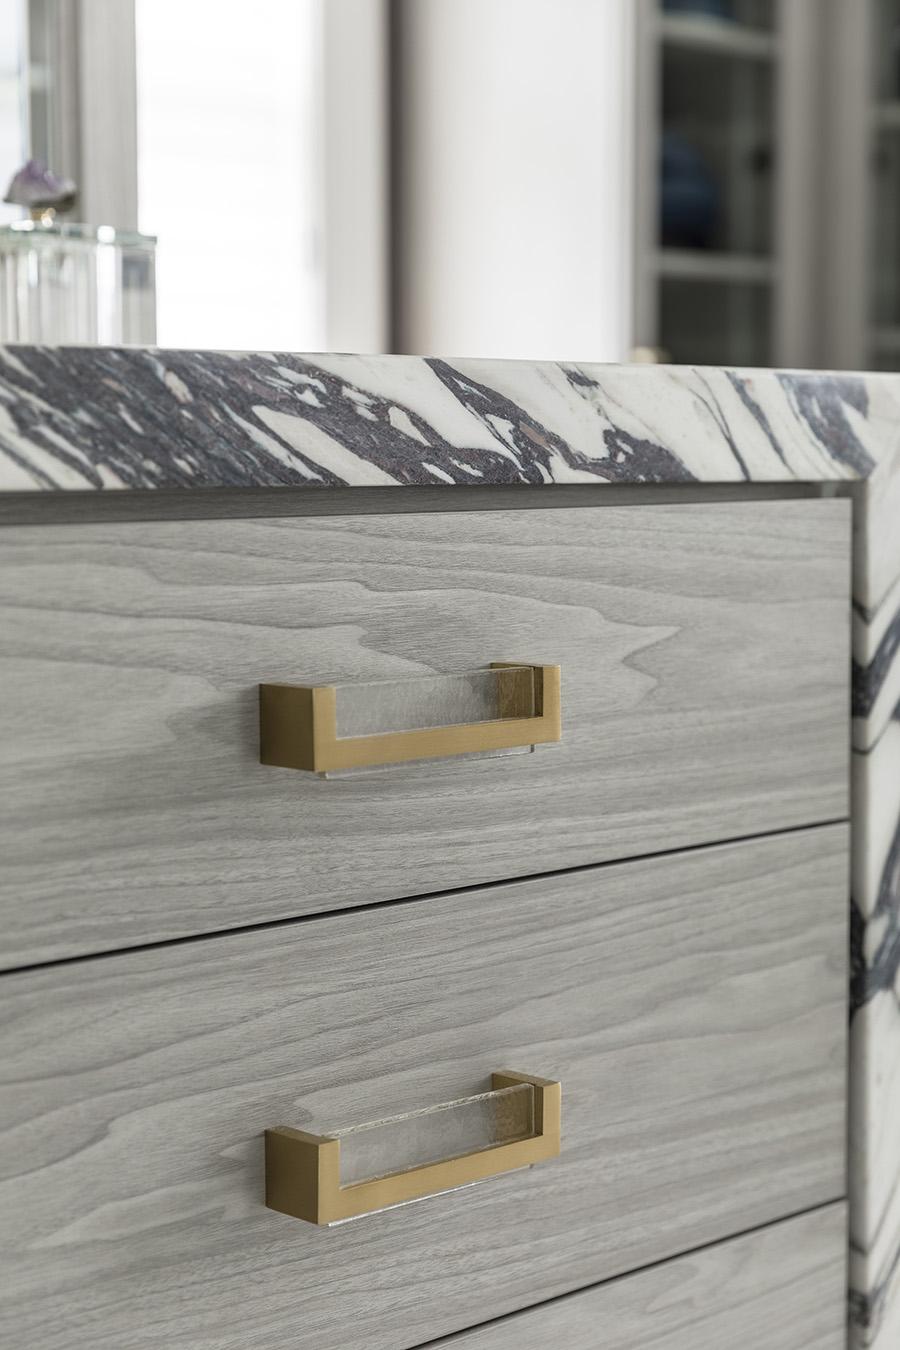 9 idea 1 decorative closet handles pulls image credit Patty Miller Boutique Closets and Cabinetry | Innovate Home Org | #DecorativeCloset #ClosetDesign #FancyCloset